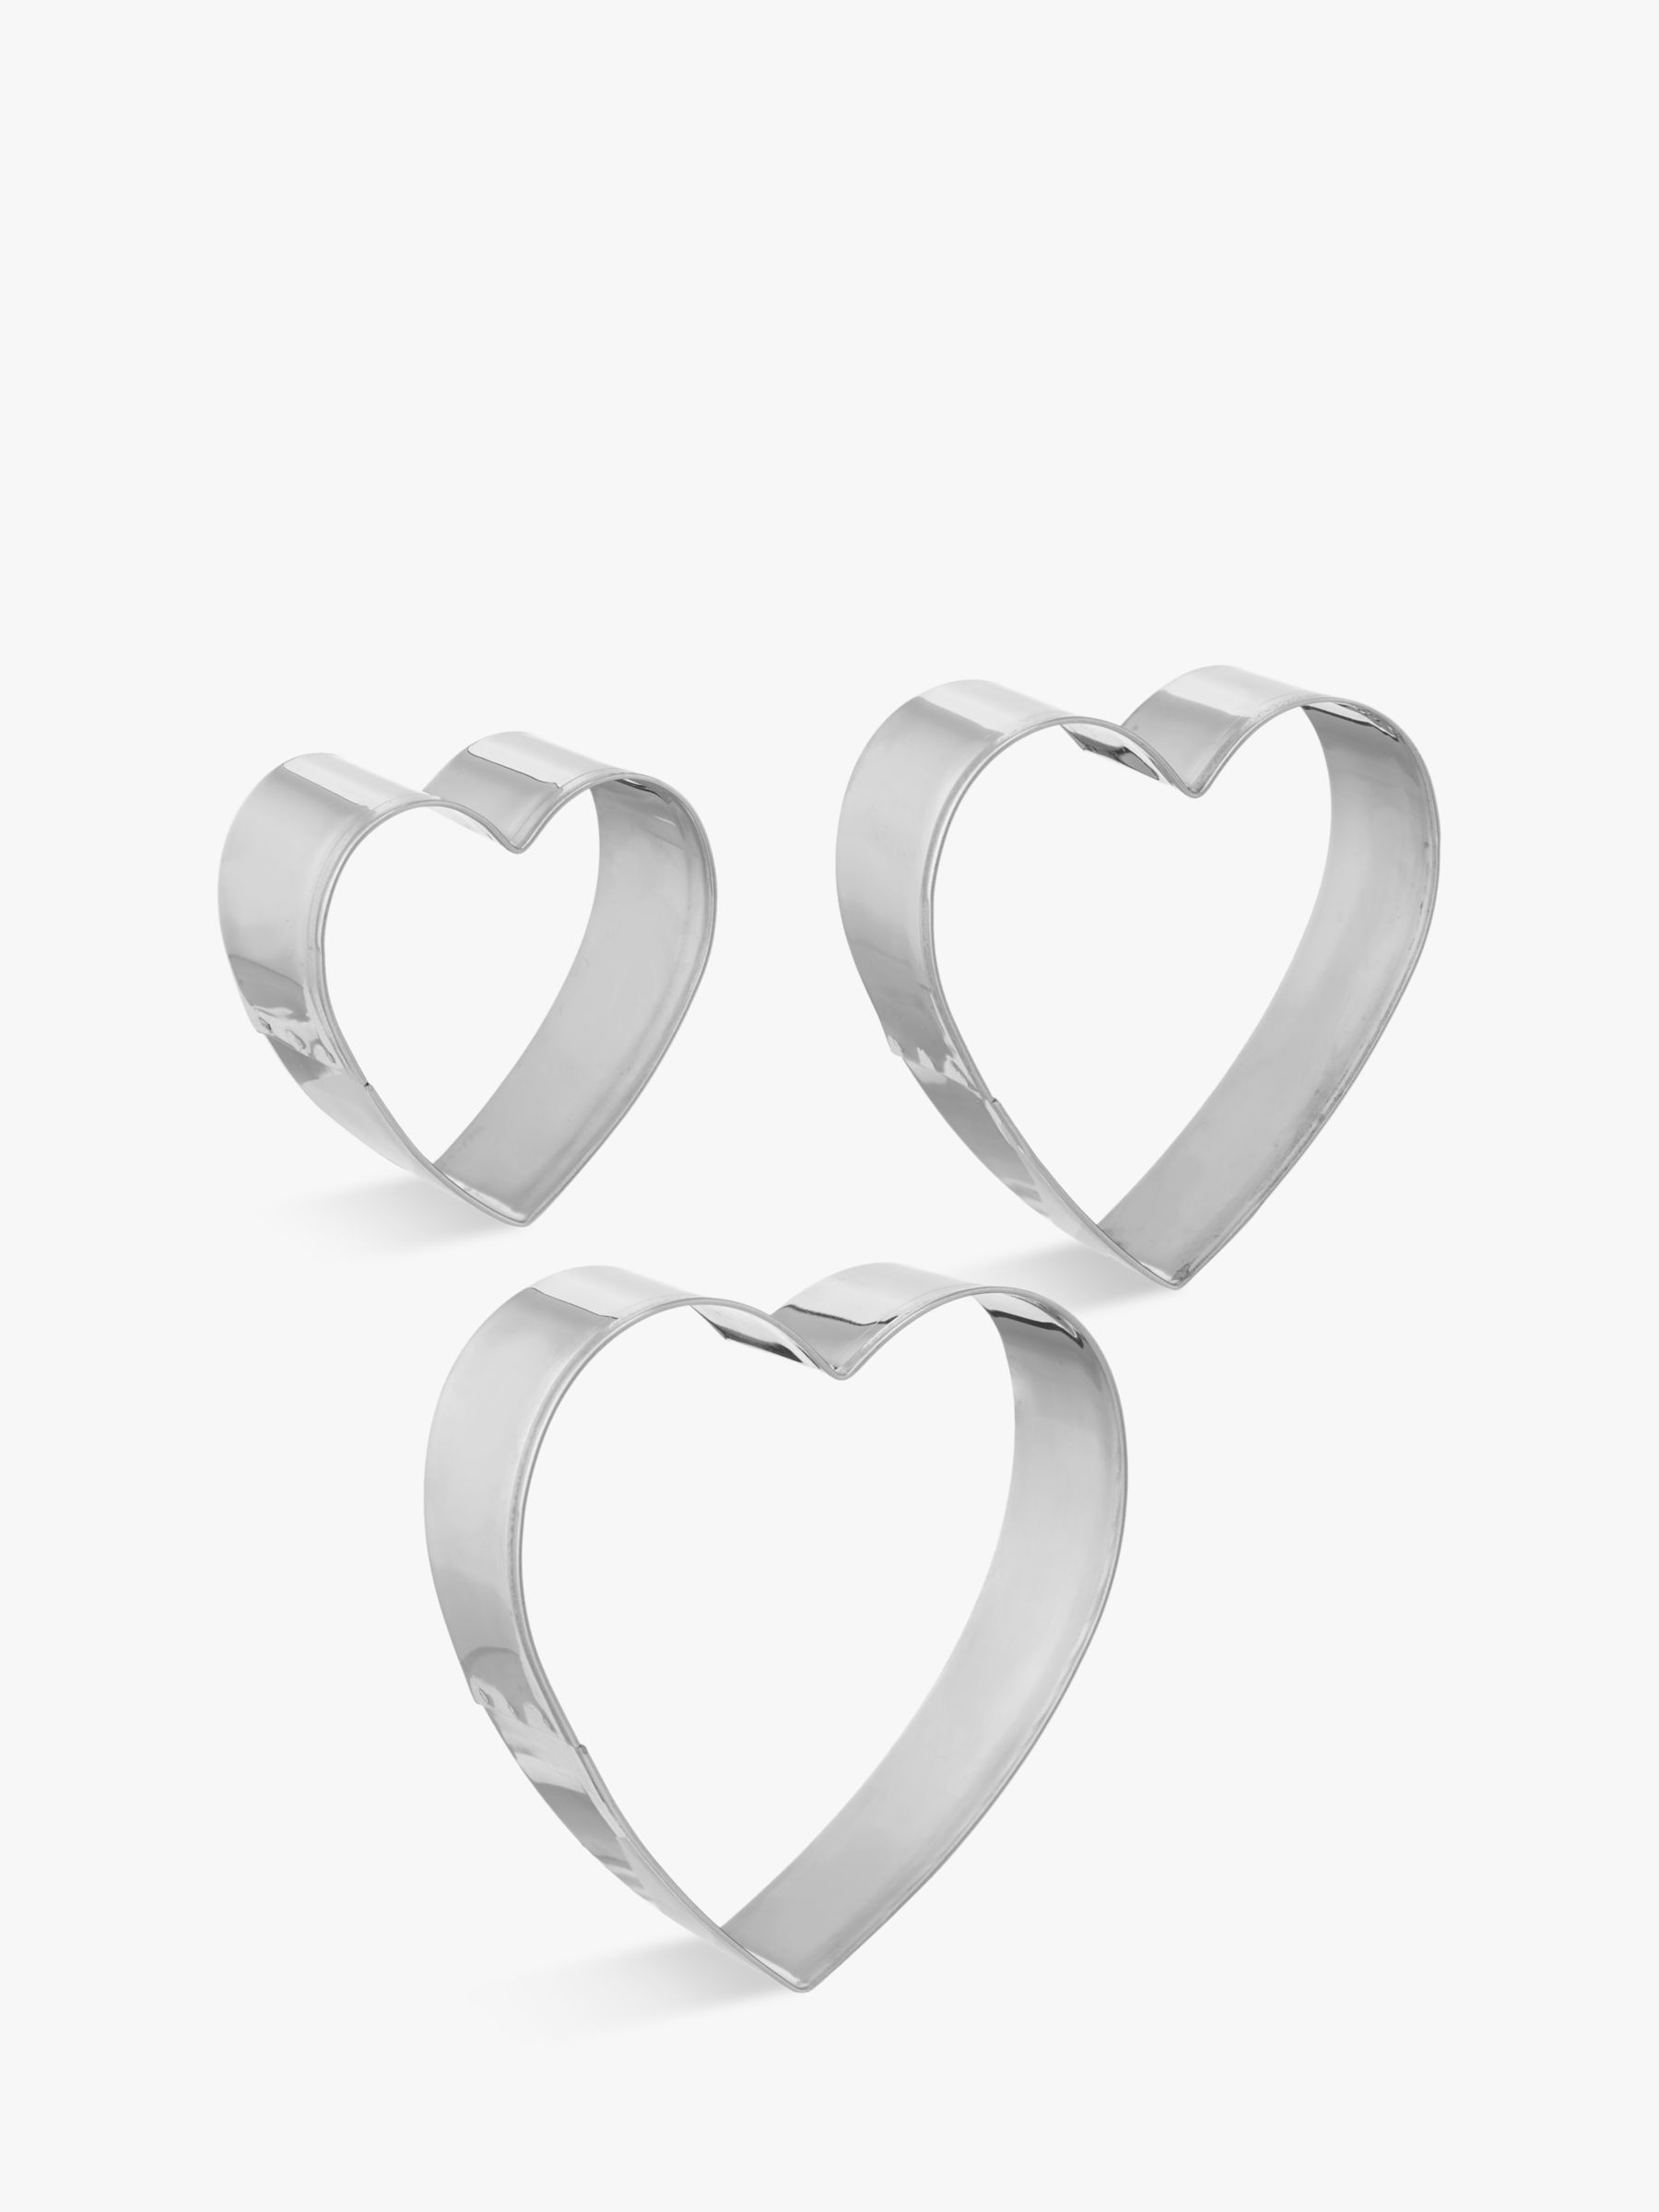 09e15f9484 John Lewis & Partners Stainless Steel Heart Cookie Cutters, Set of 3 at  John Lewis & Partners